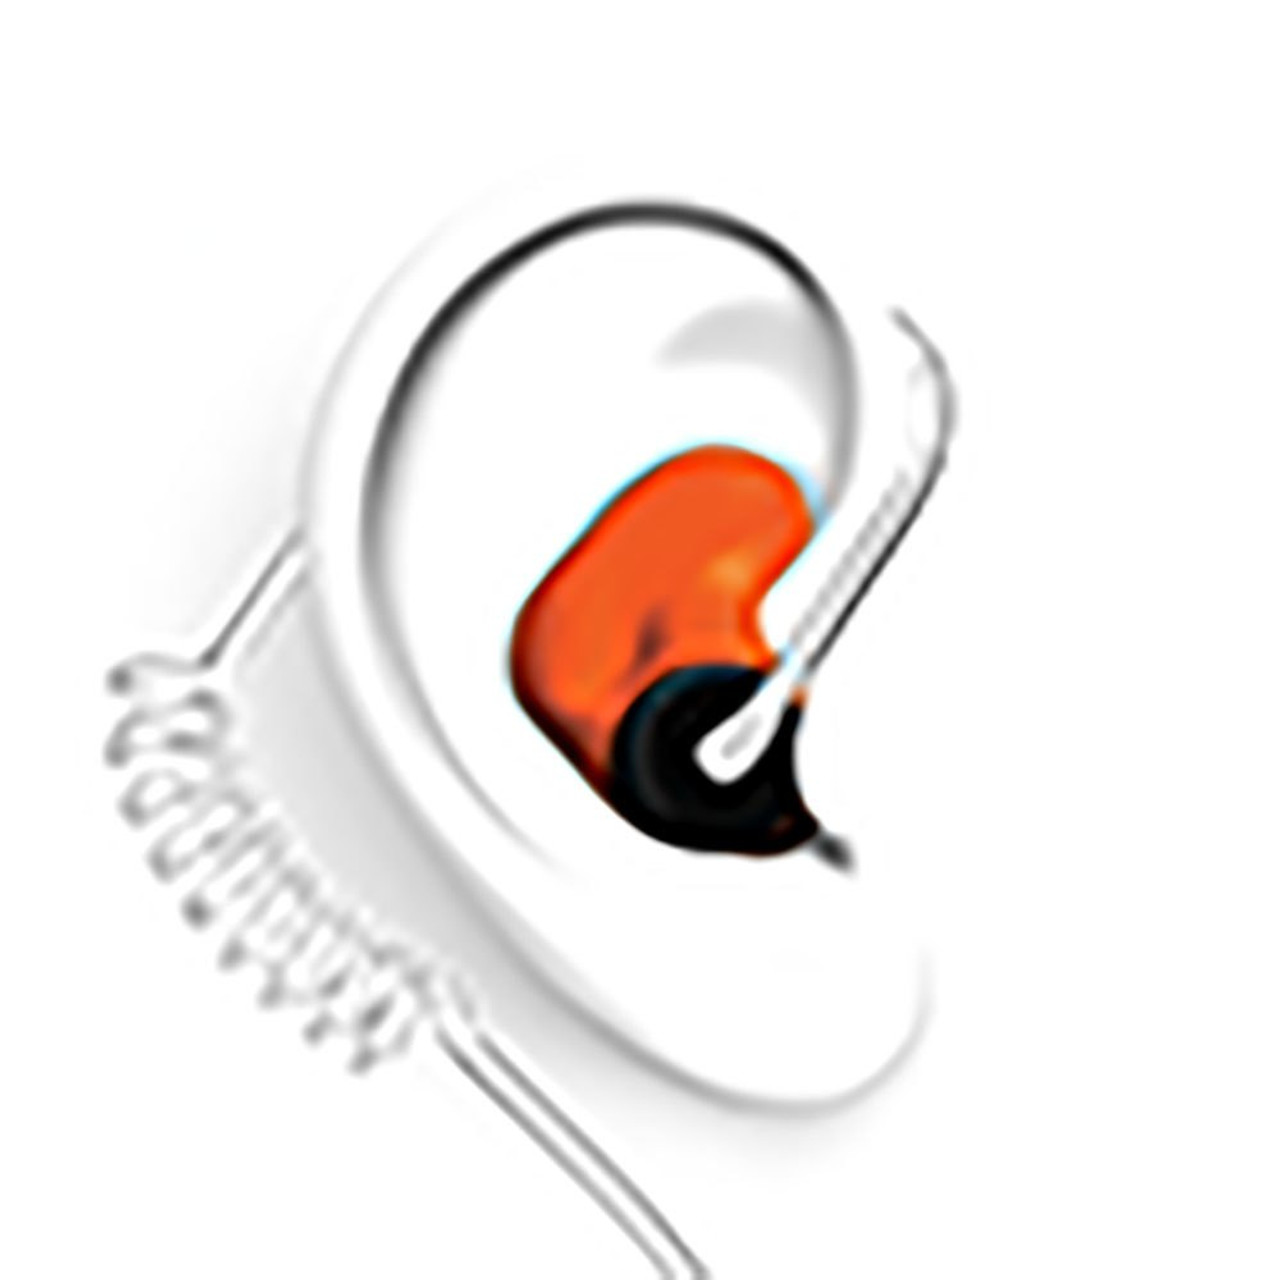 DECIBULLZ Orange Two Way Radio Headset Ear Plug